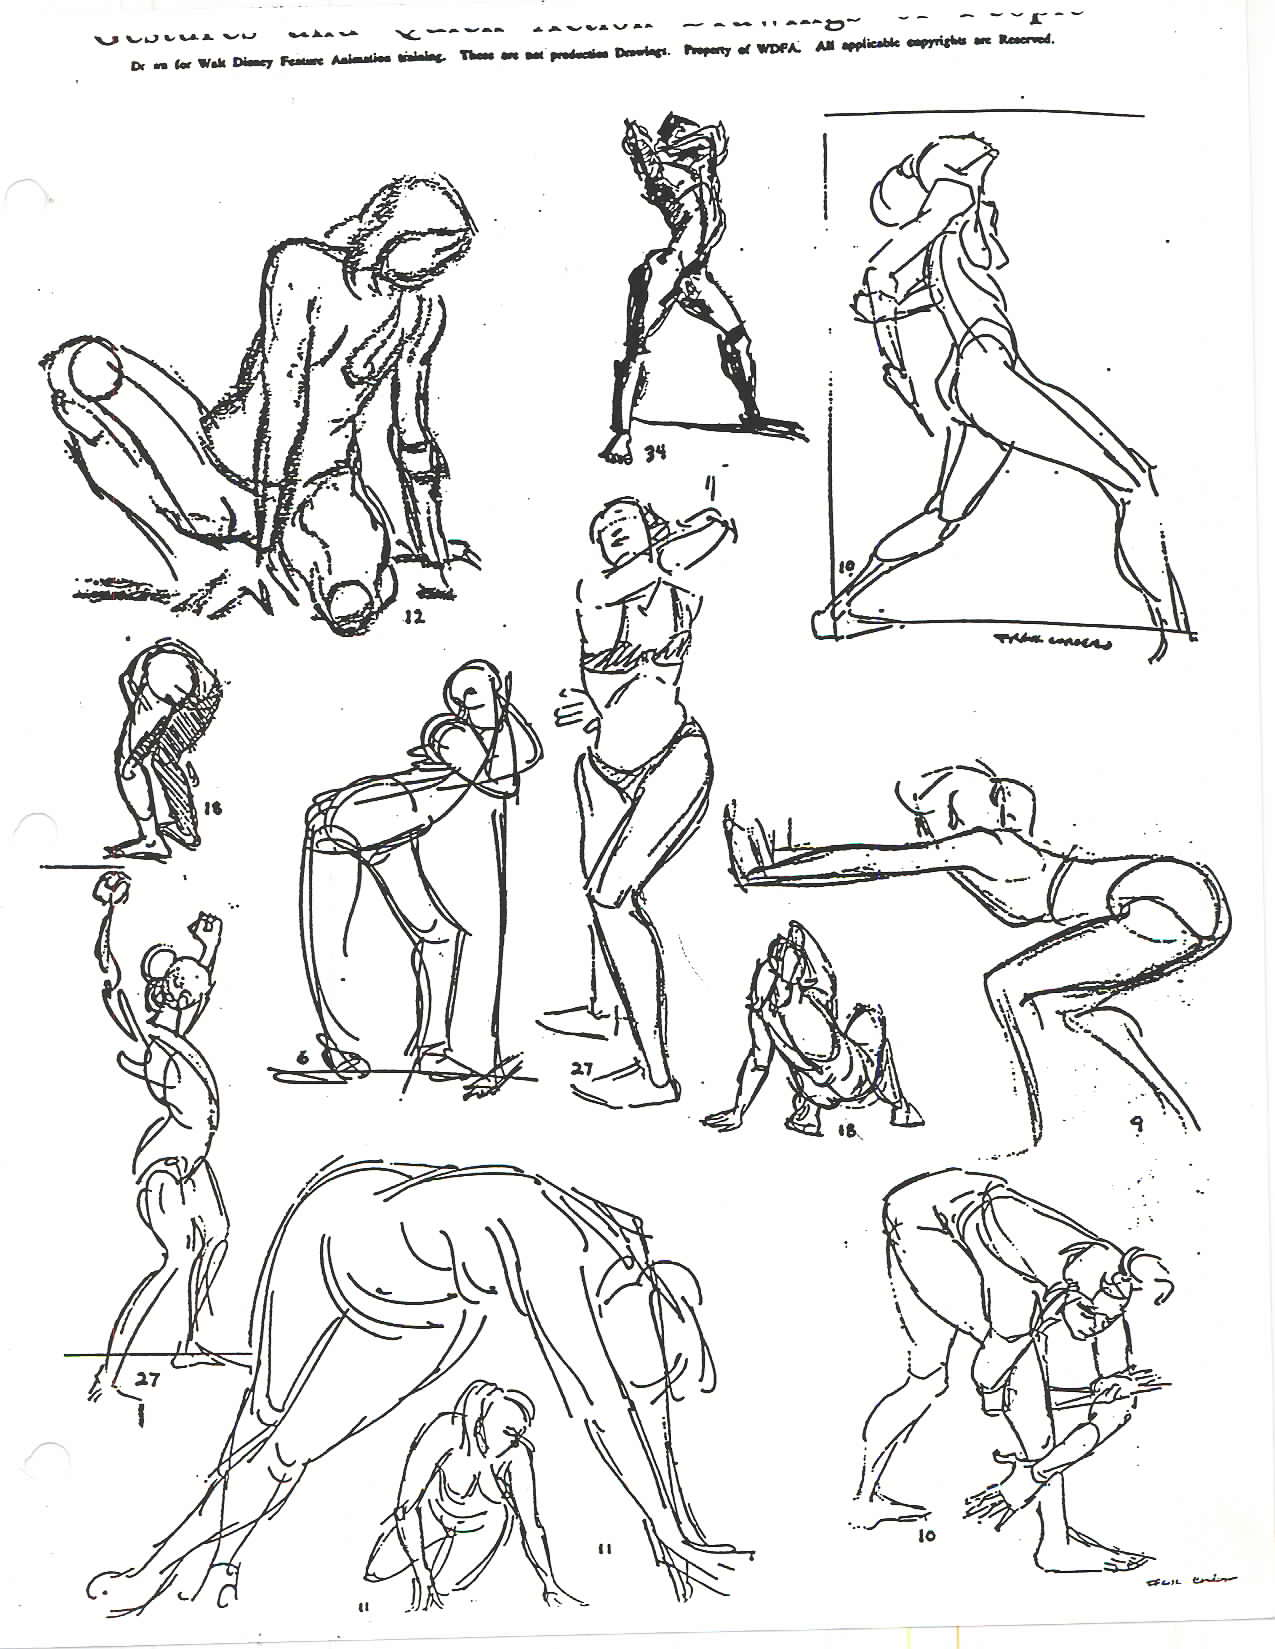 2d Character Design Pdf : Walt disney sample portfolio notes page g